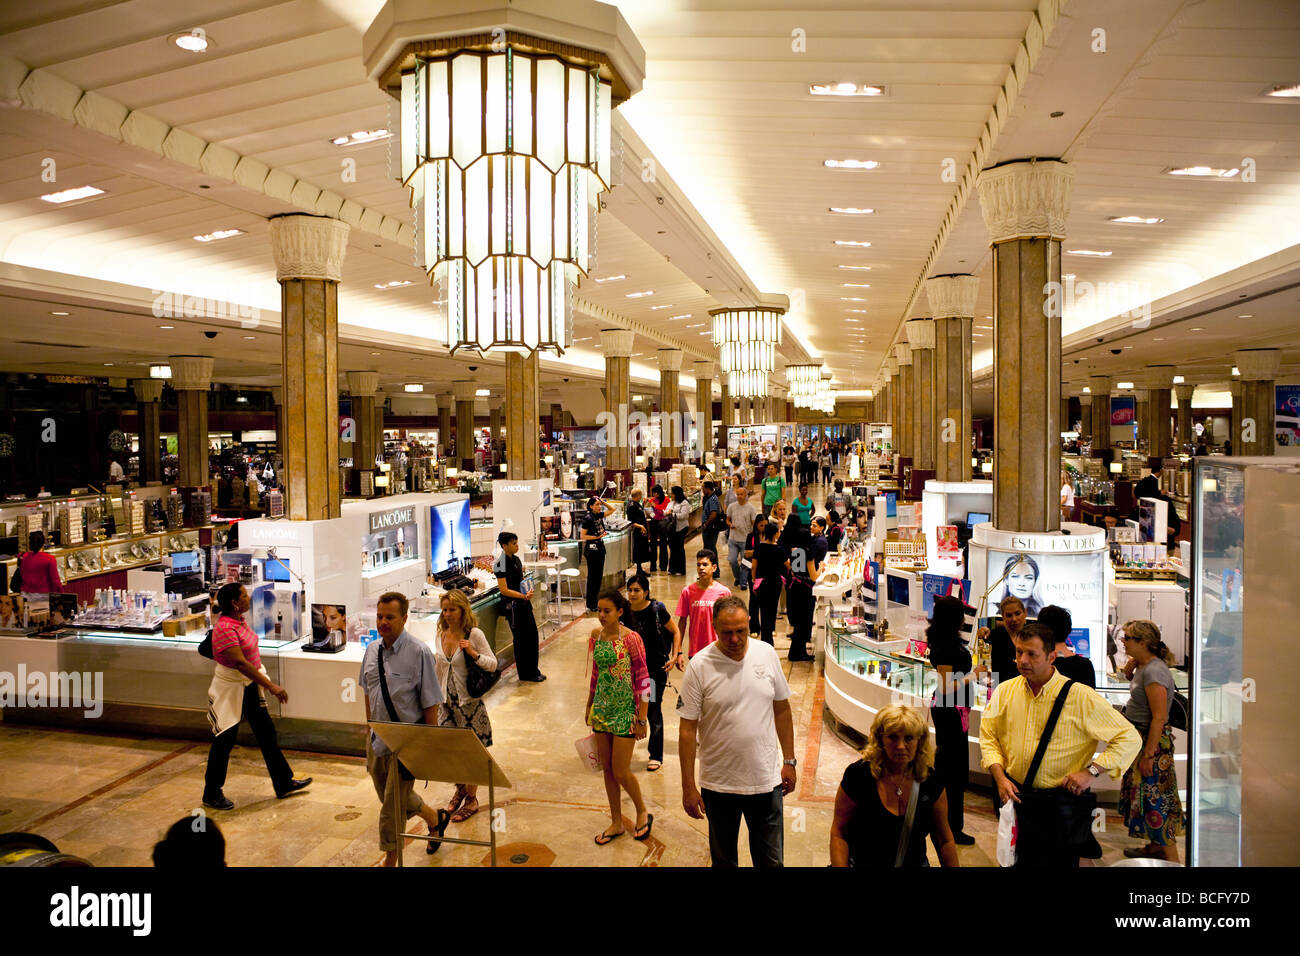 Macys Department Store Interior Stock Photos & Macys Department ...